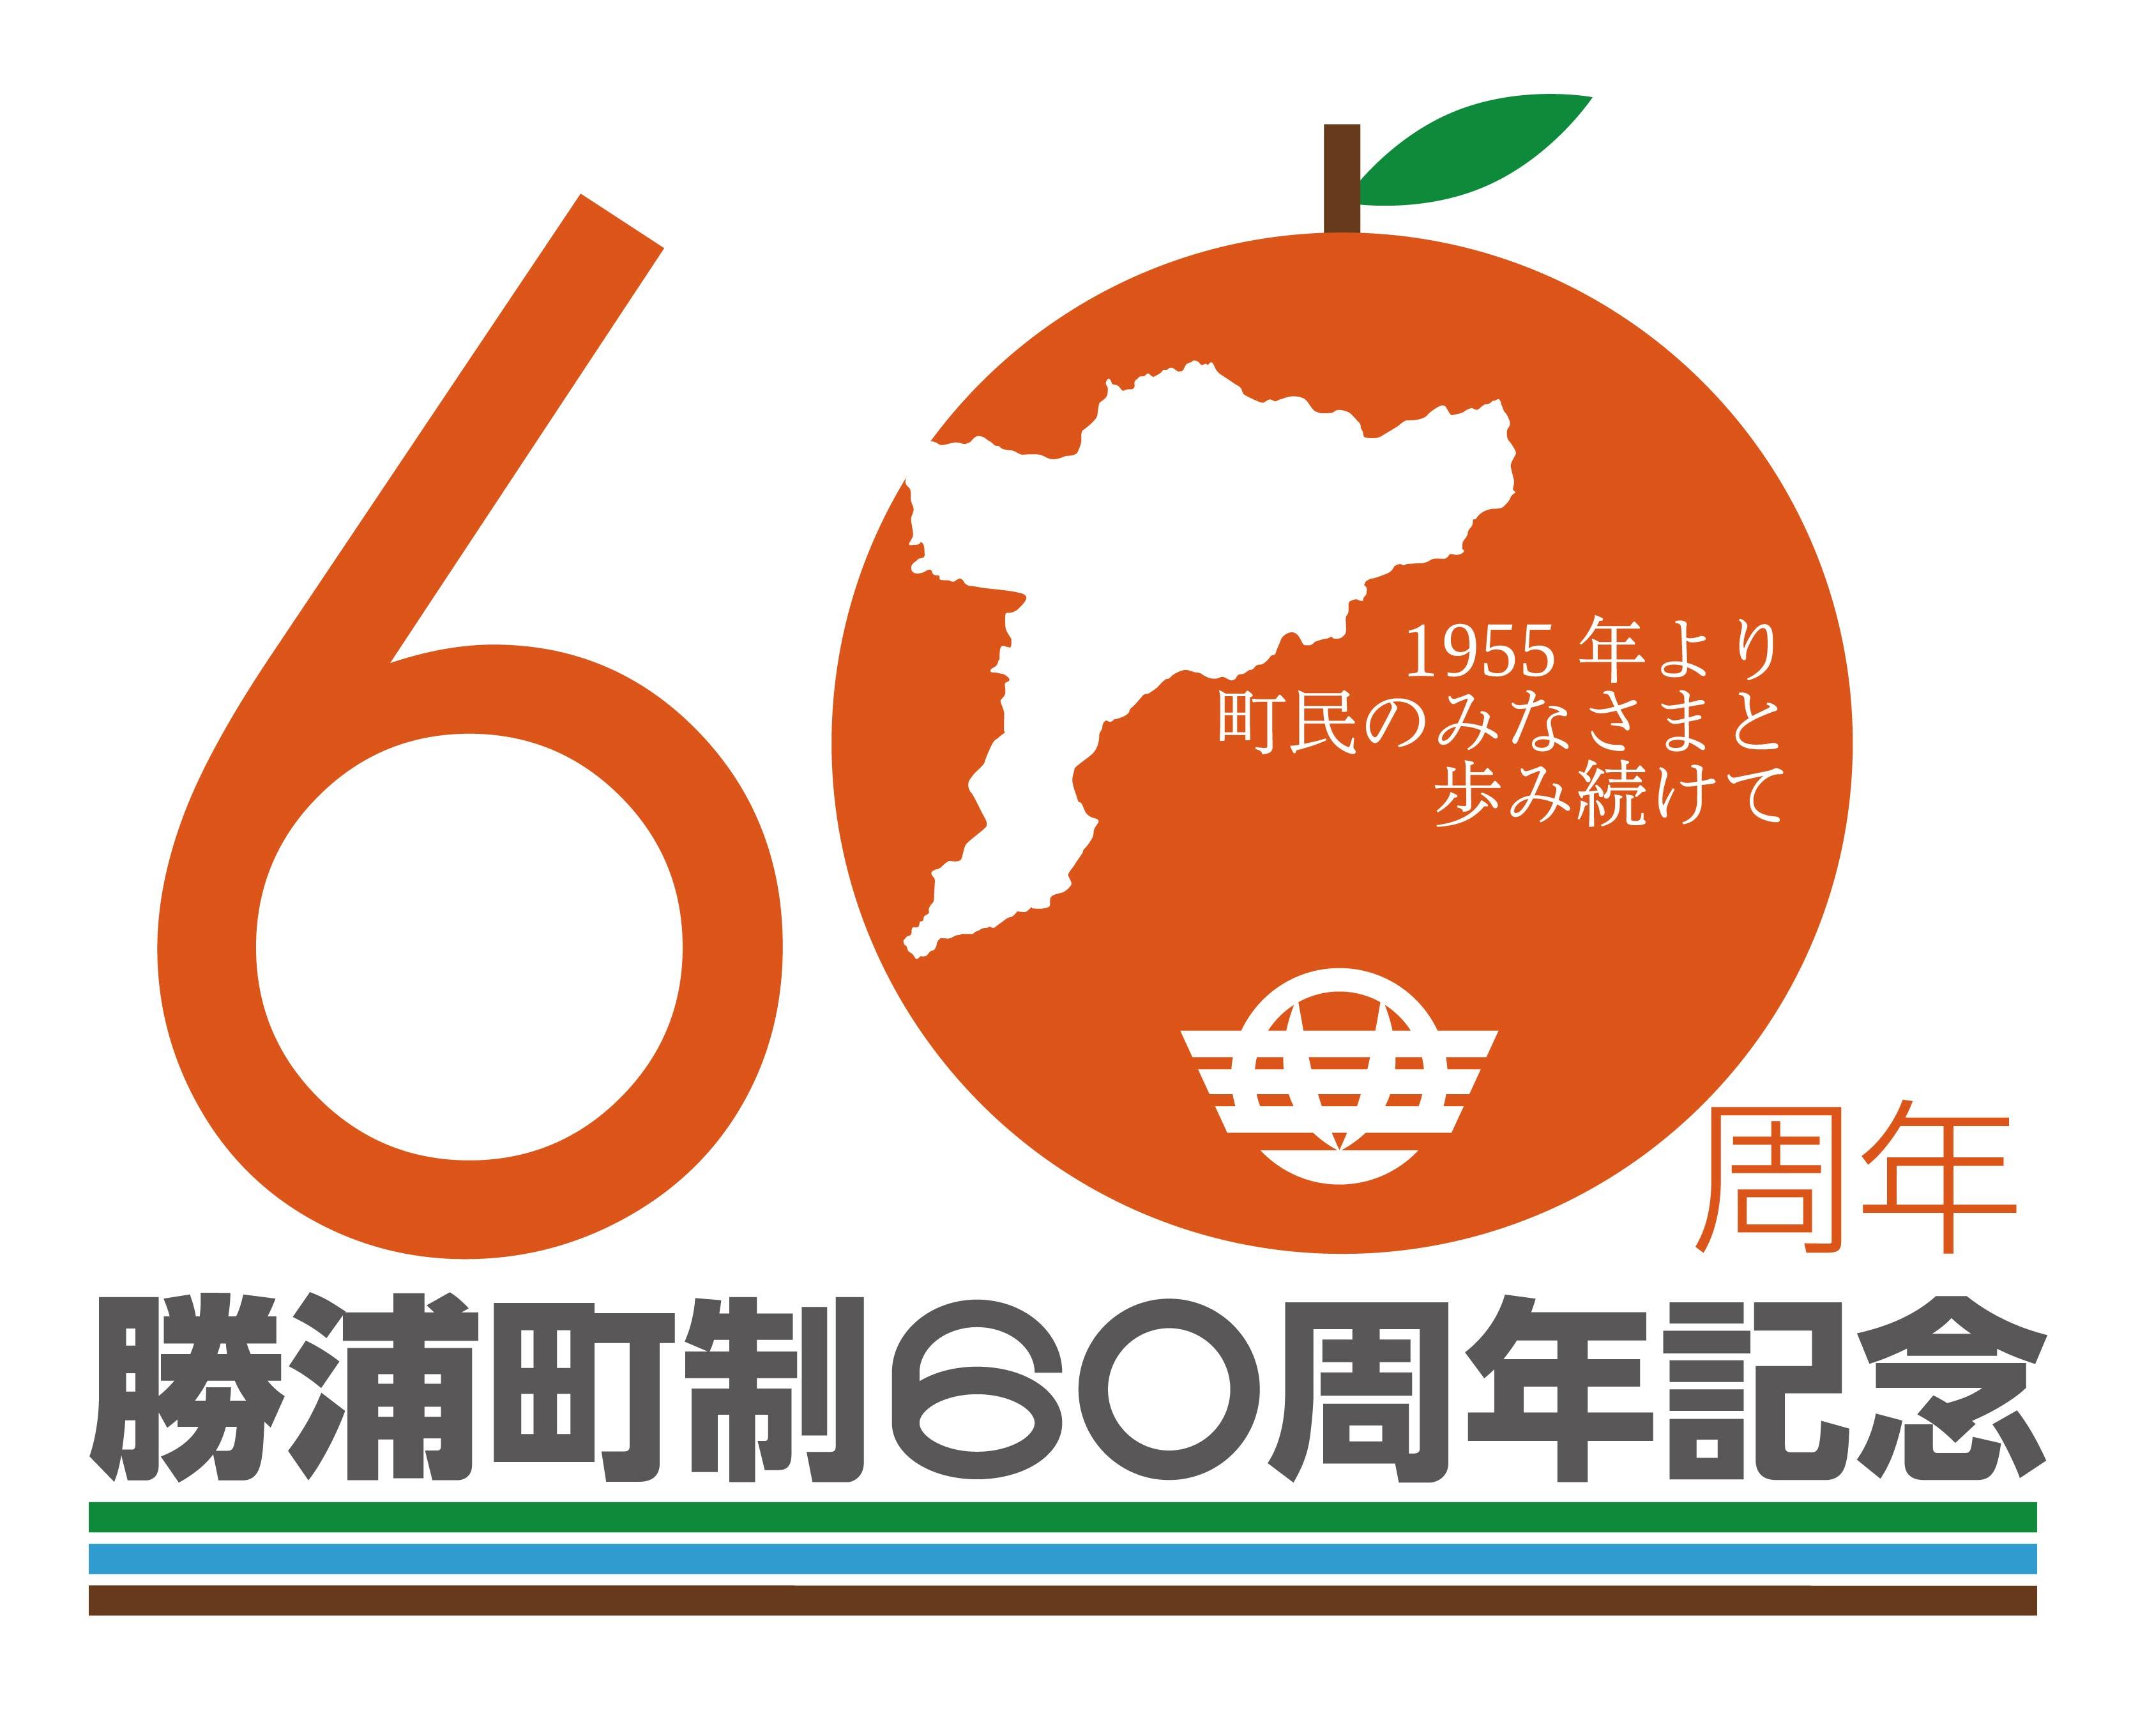 勝浦町制60周年ロゴ